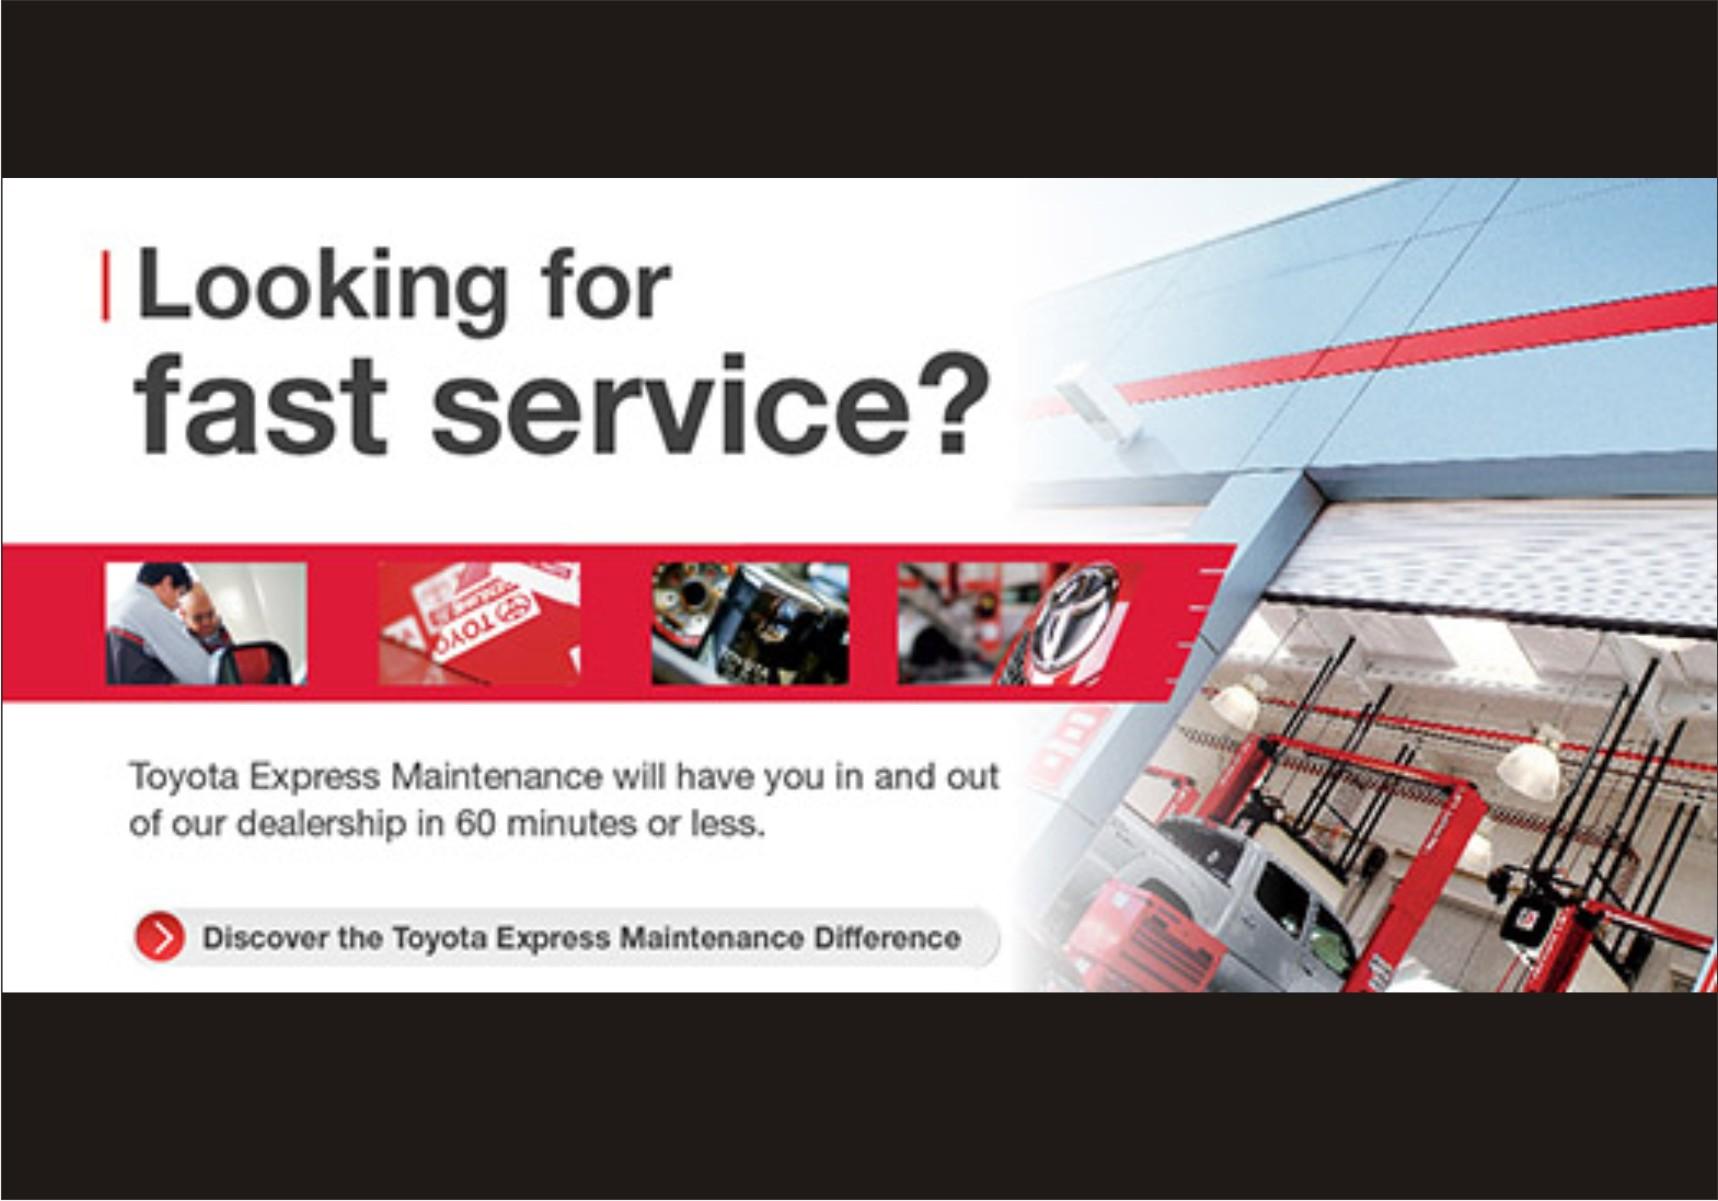 Visit University Toyota for Toyota Express Maintenance TXM Service.